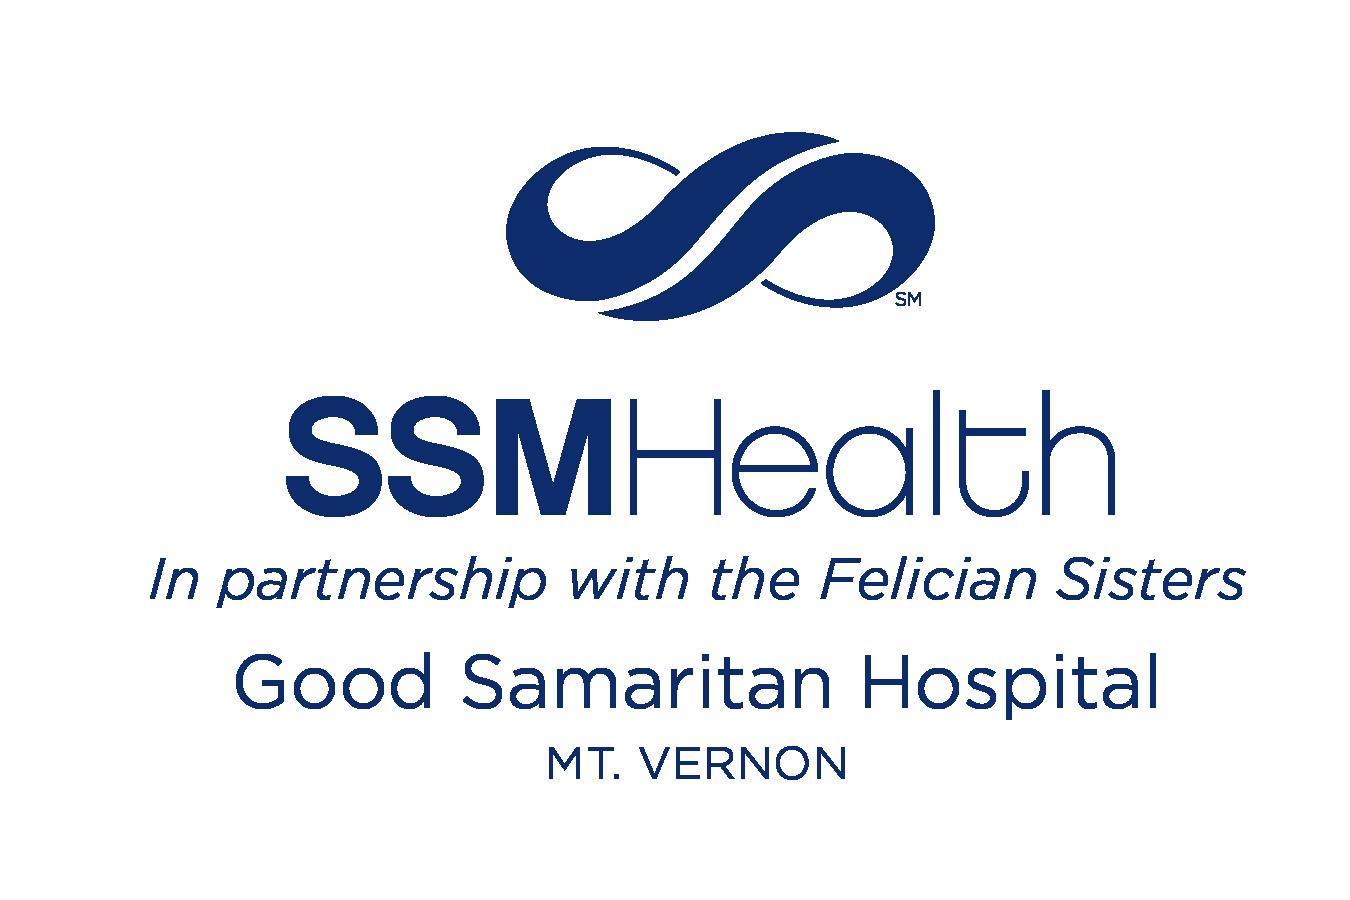 ssm health.jpg